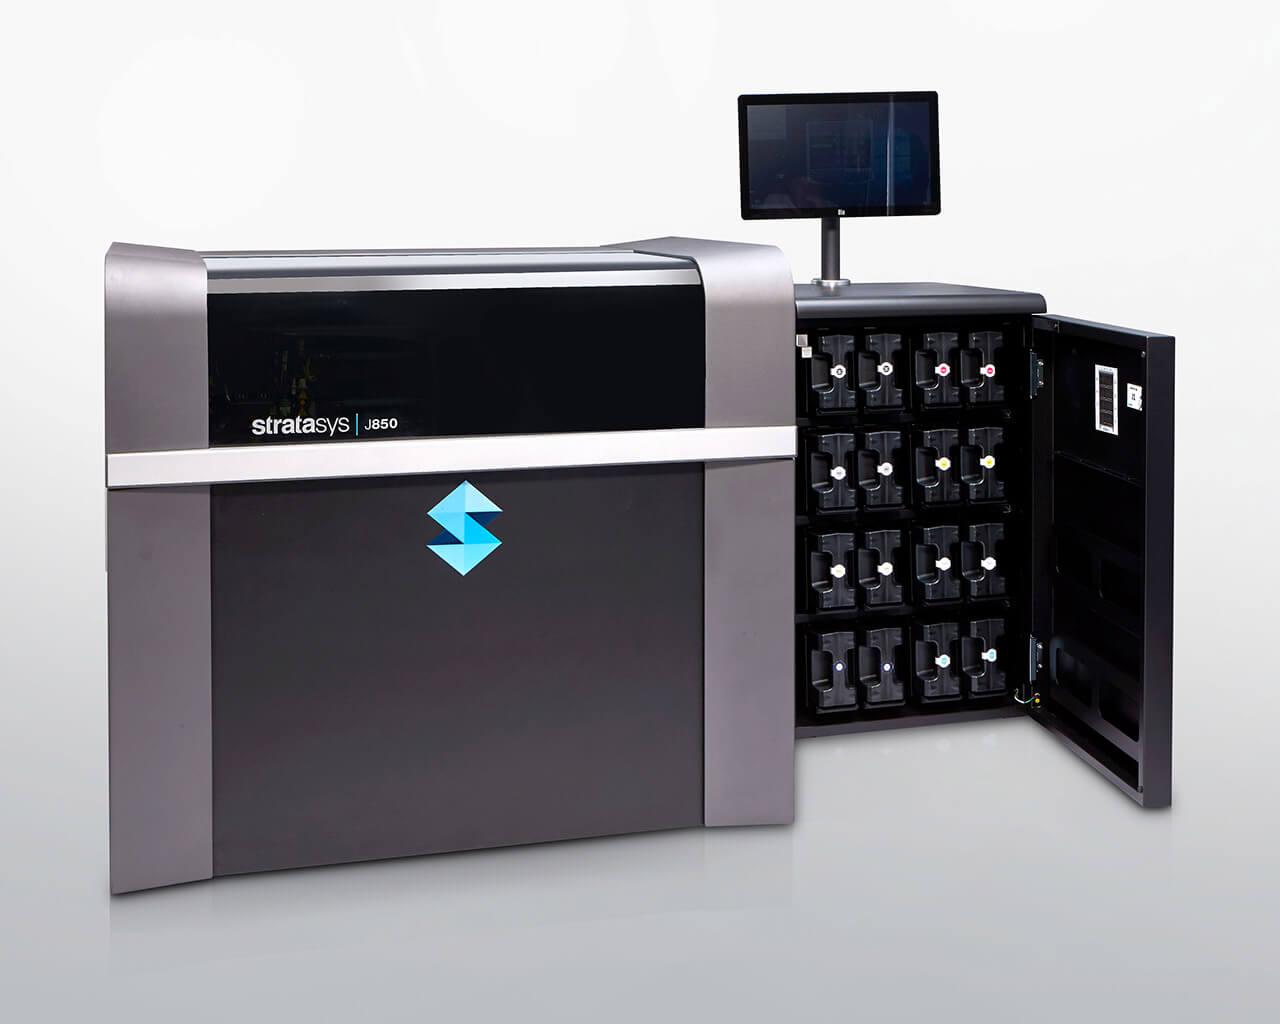 J835 Stratasys - 3D printers